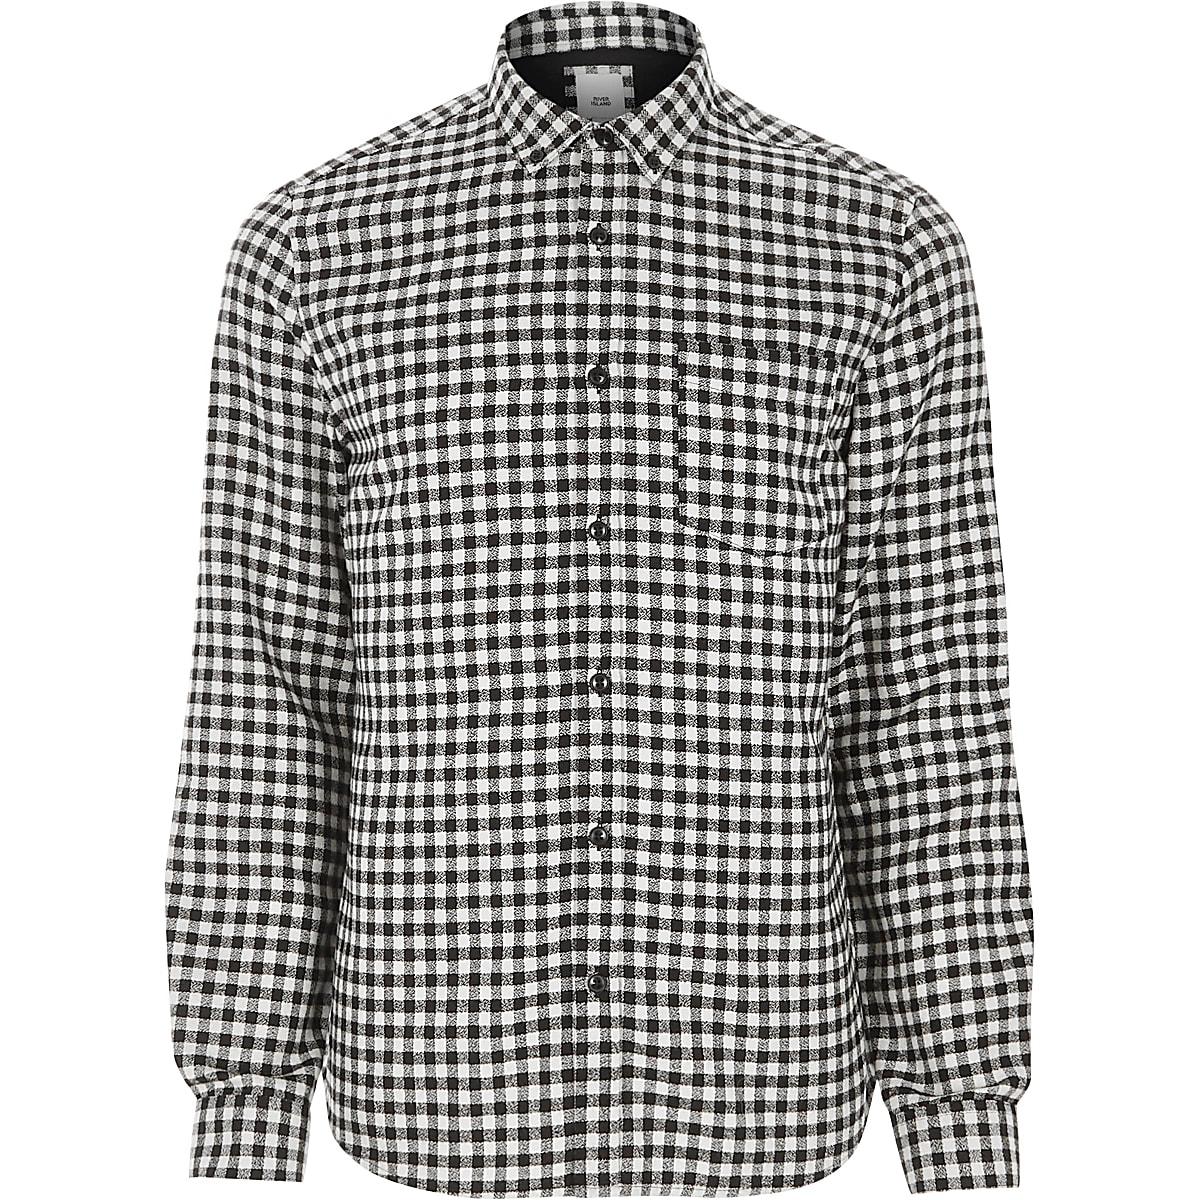 Black gingham long sleeve shirt